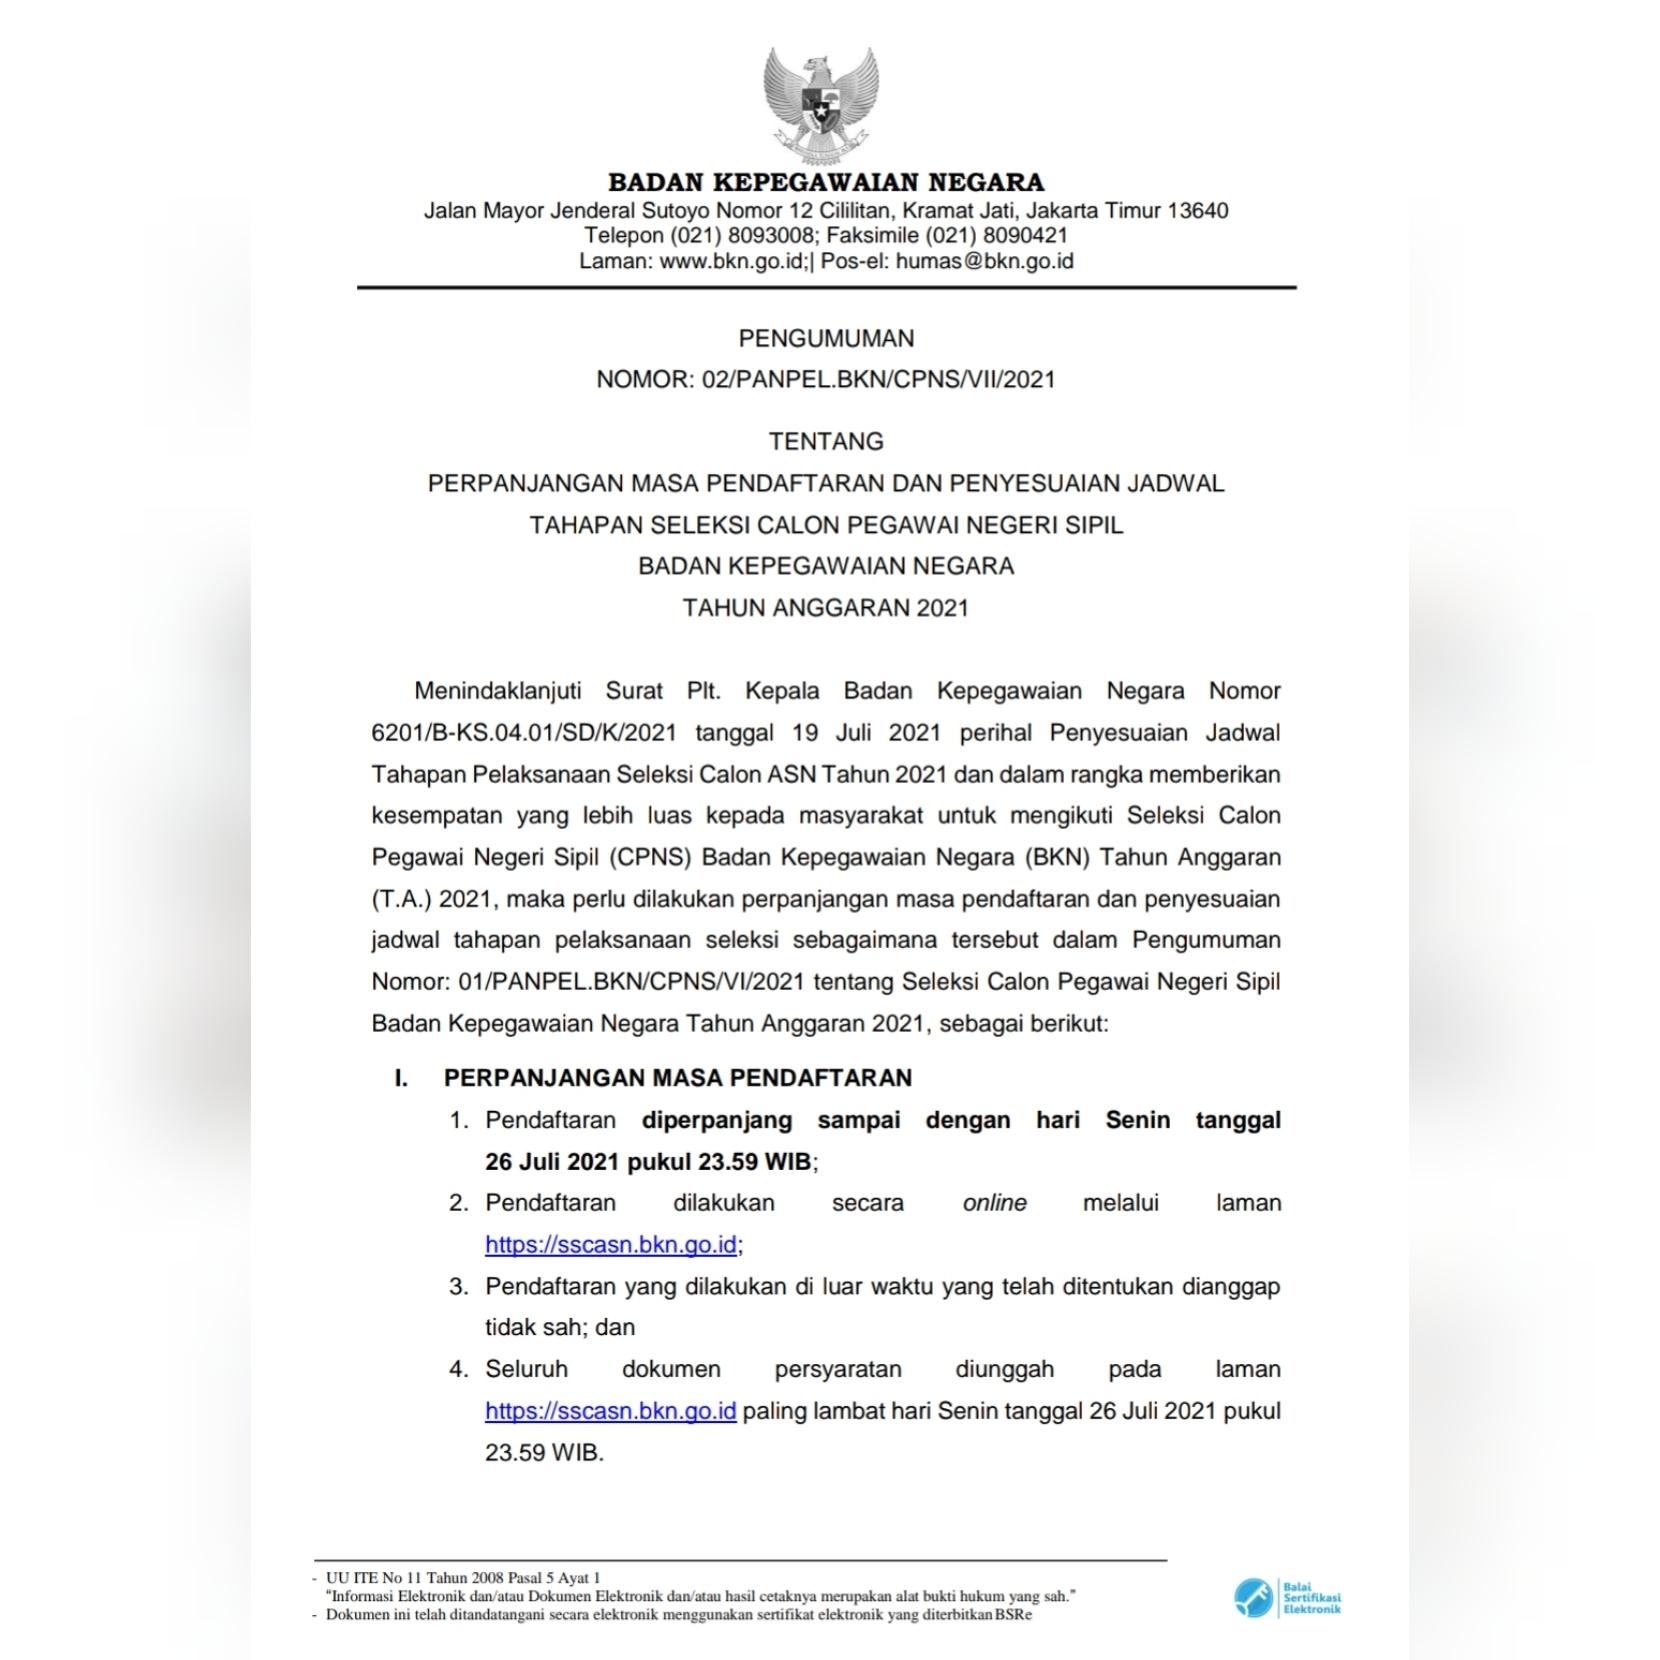 Perpanjangan Masa Pendaftaran dan Penyesuaian Jadwal Tahapan Seleksi CPNS BKN TA 2021